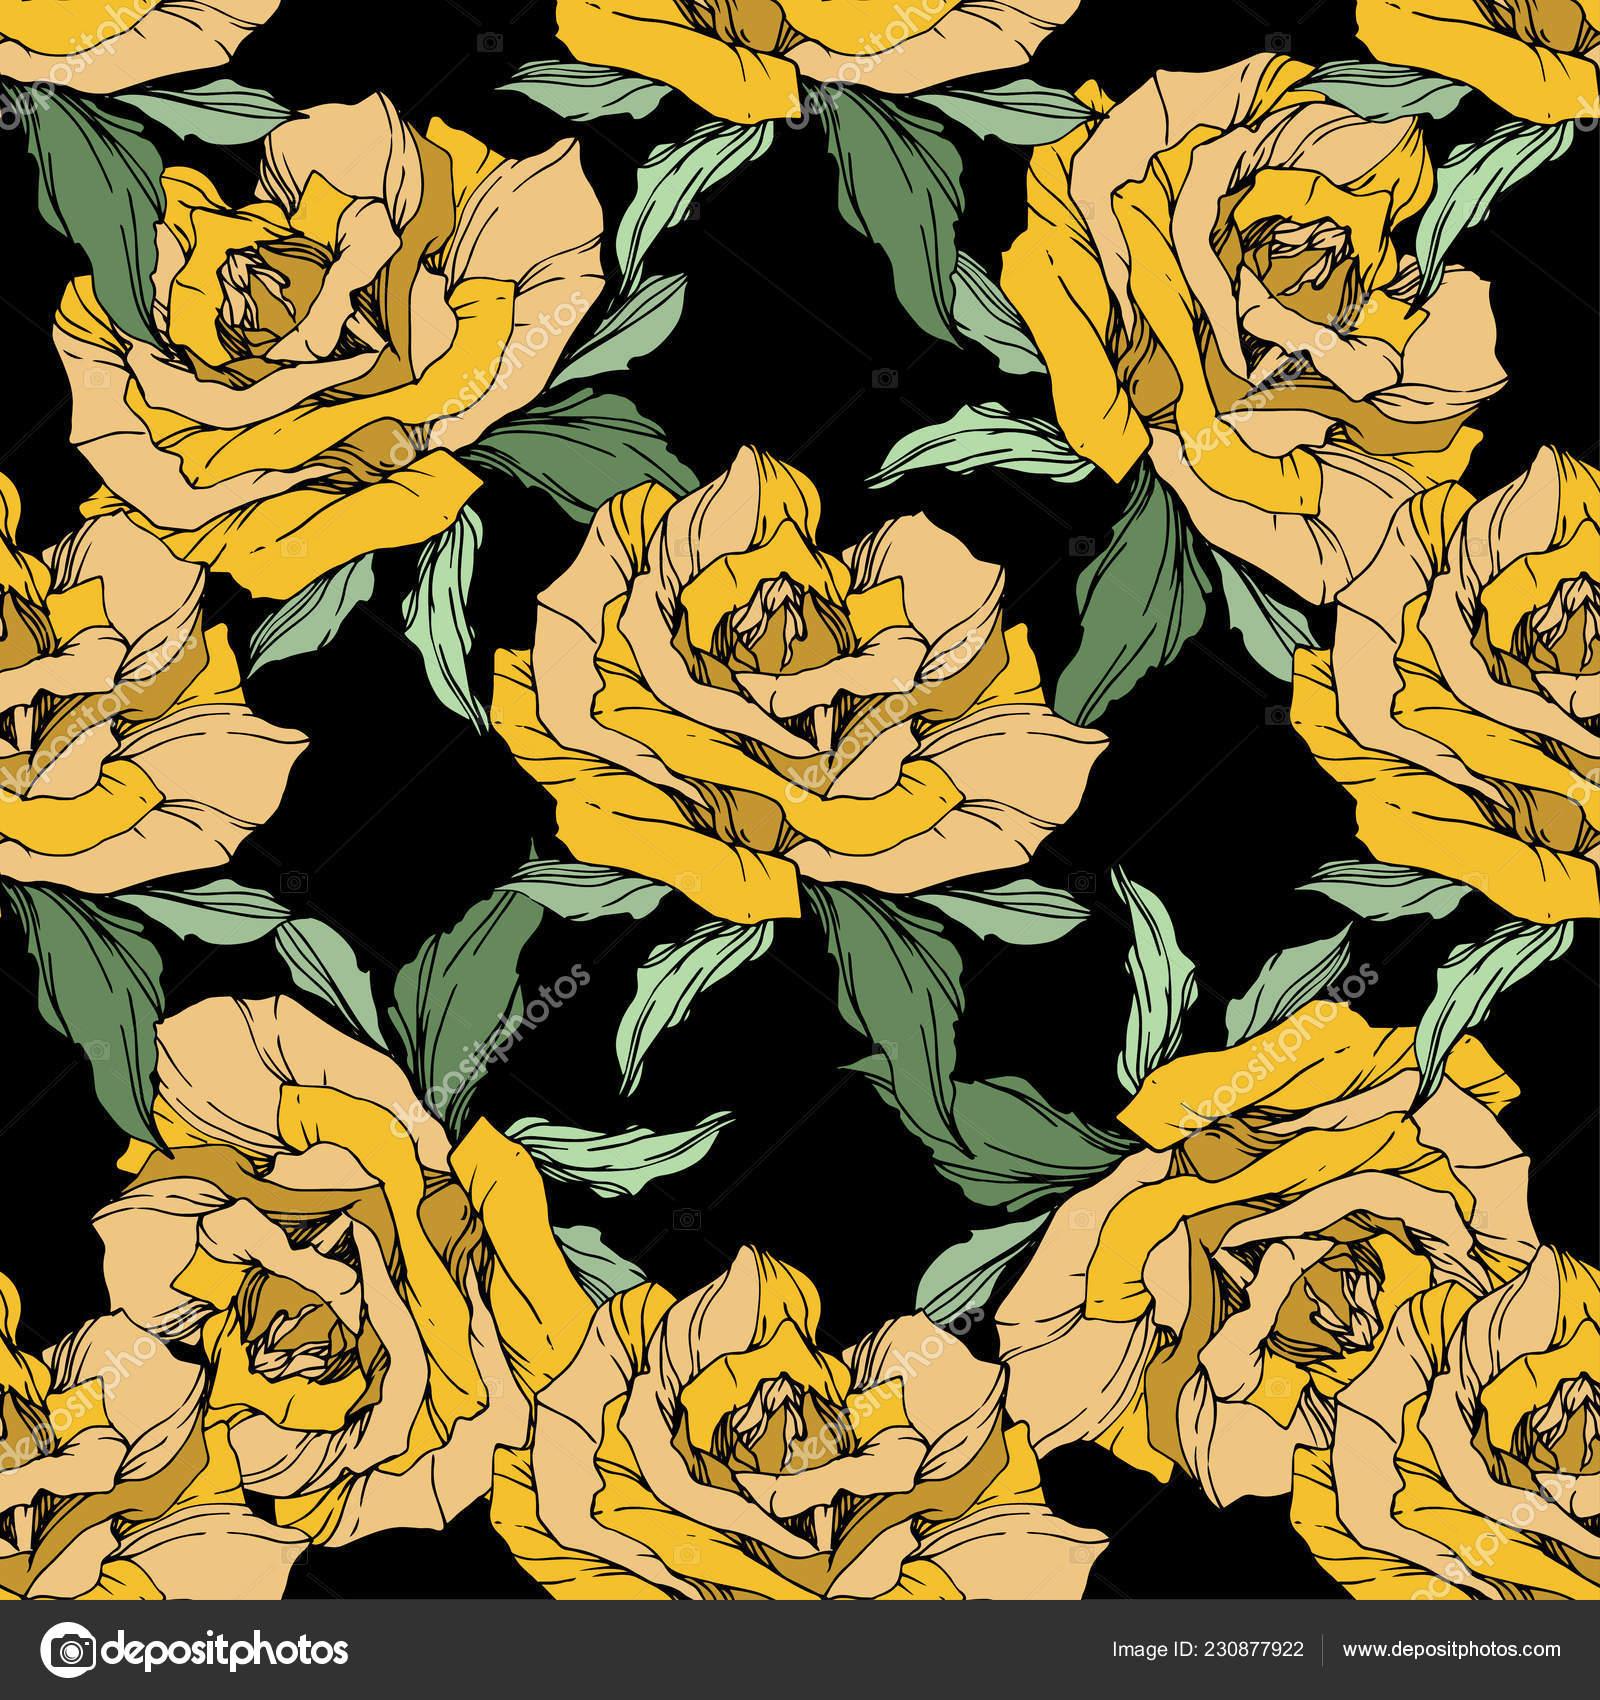 Rosas Amarillas Tinta Grabado Arte Patron Fondo Transparente Fondo